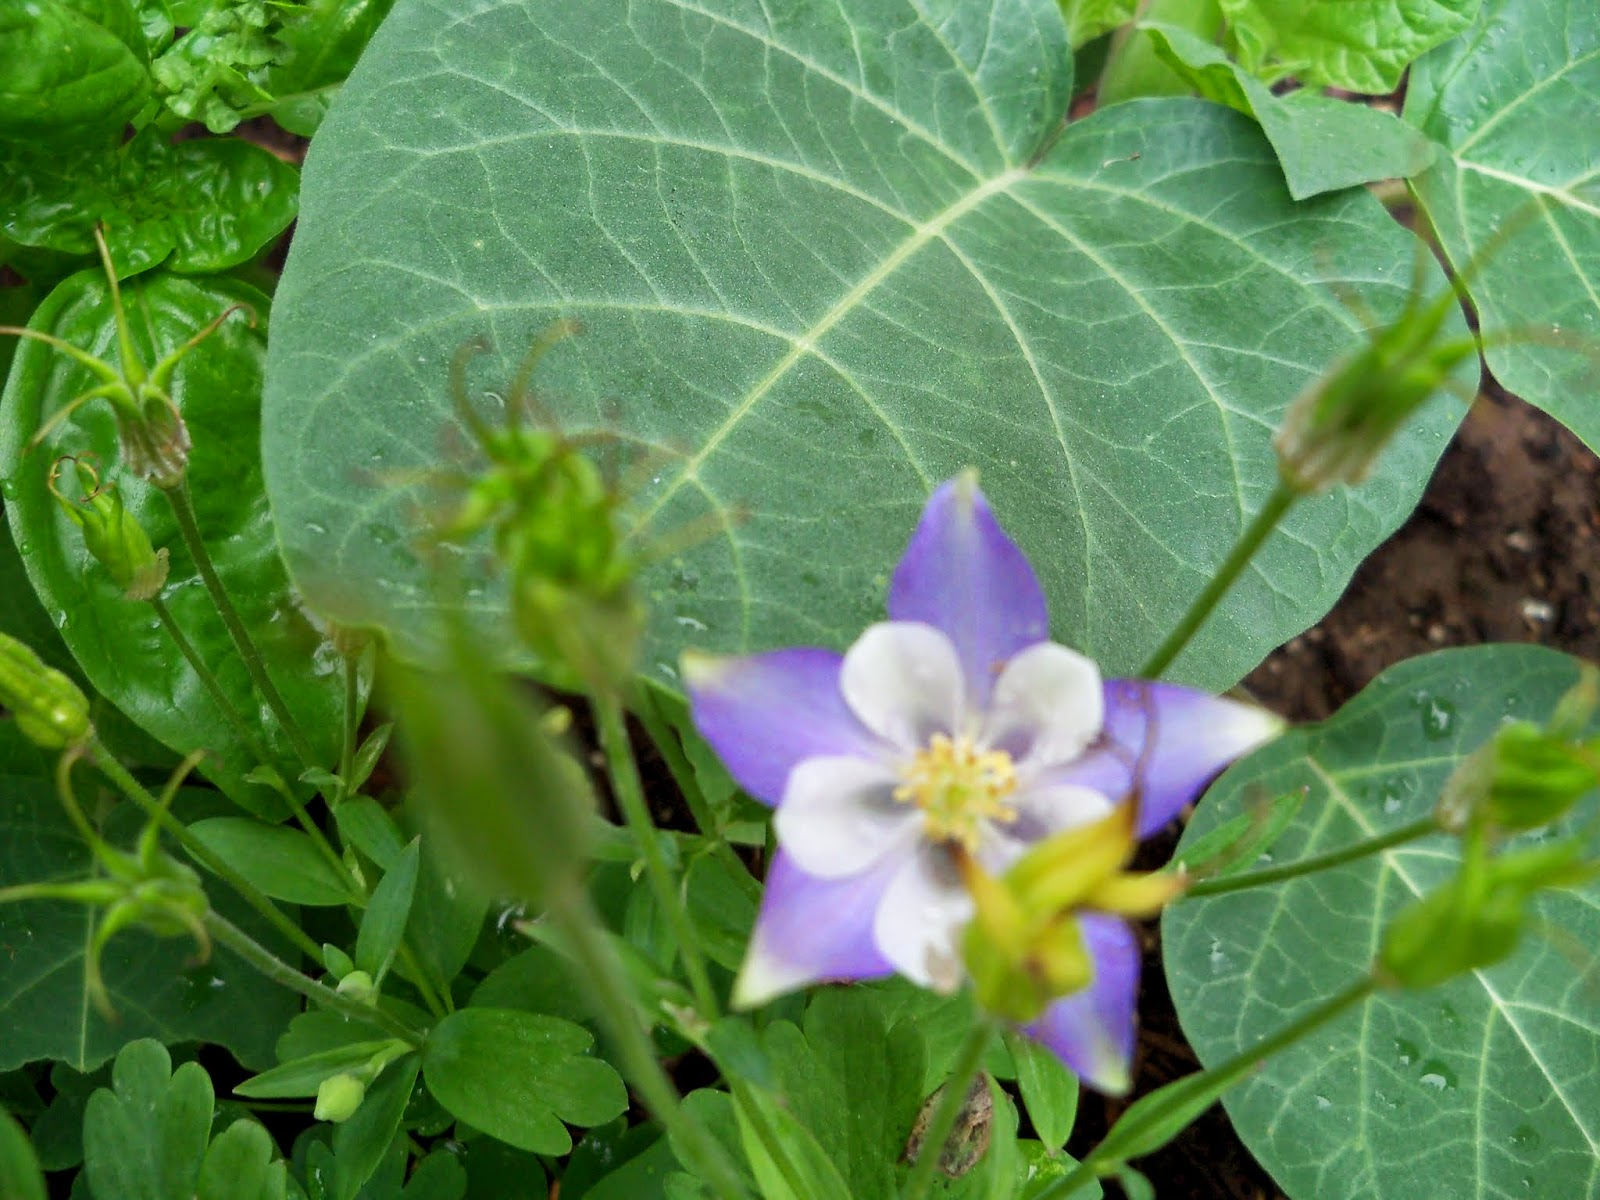 Gardening 2014 - 116_1845.JPG